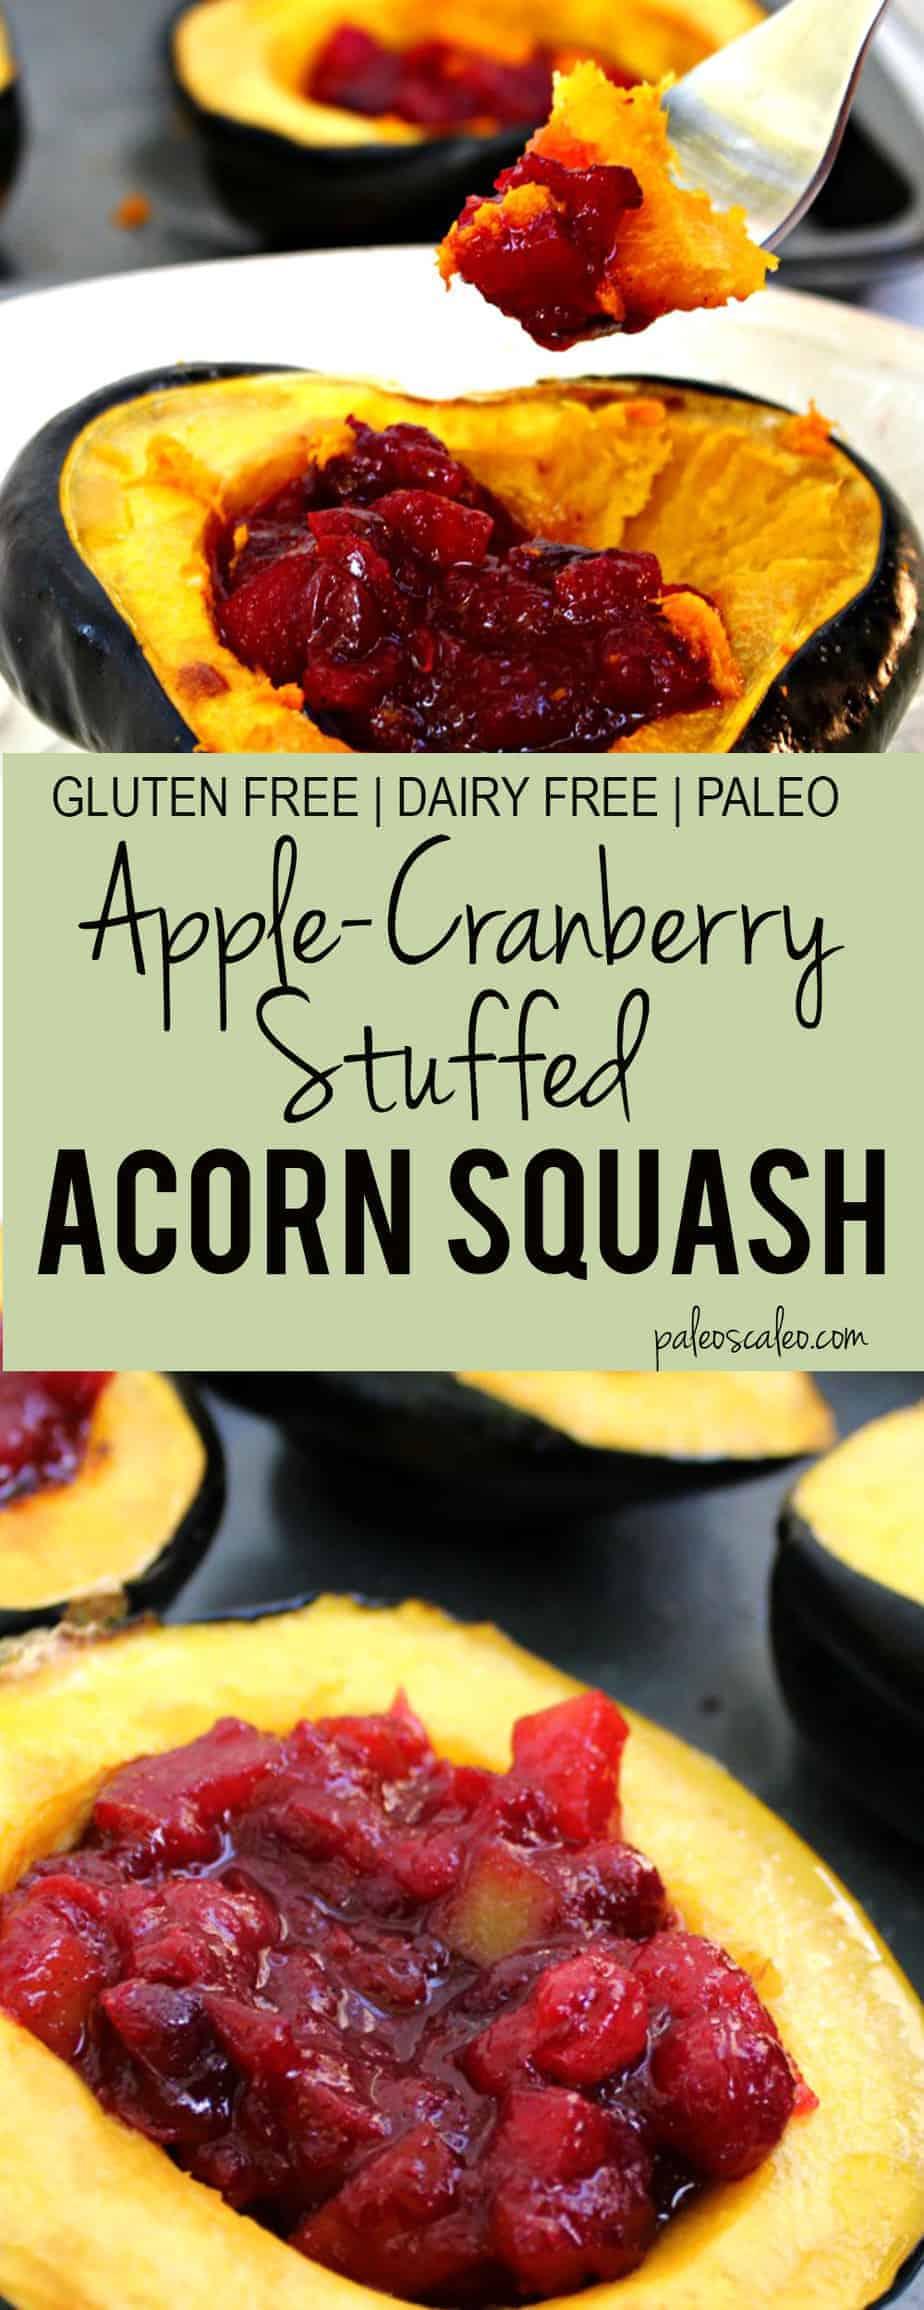 Apple Cranberry Stuffed Acorn Squash | PaleoScaleo.com